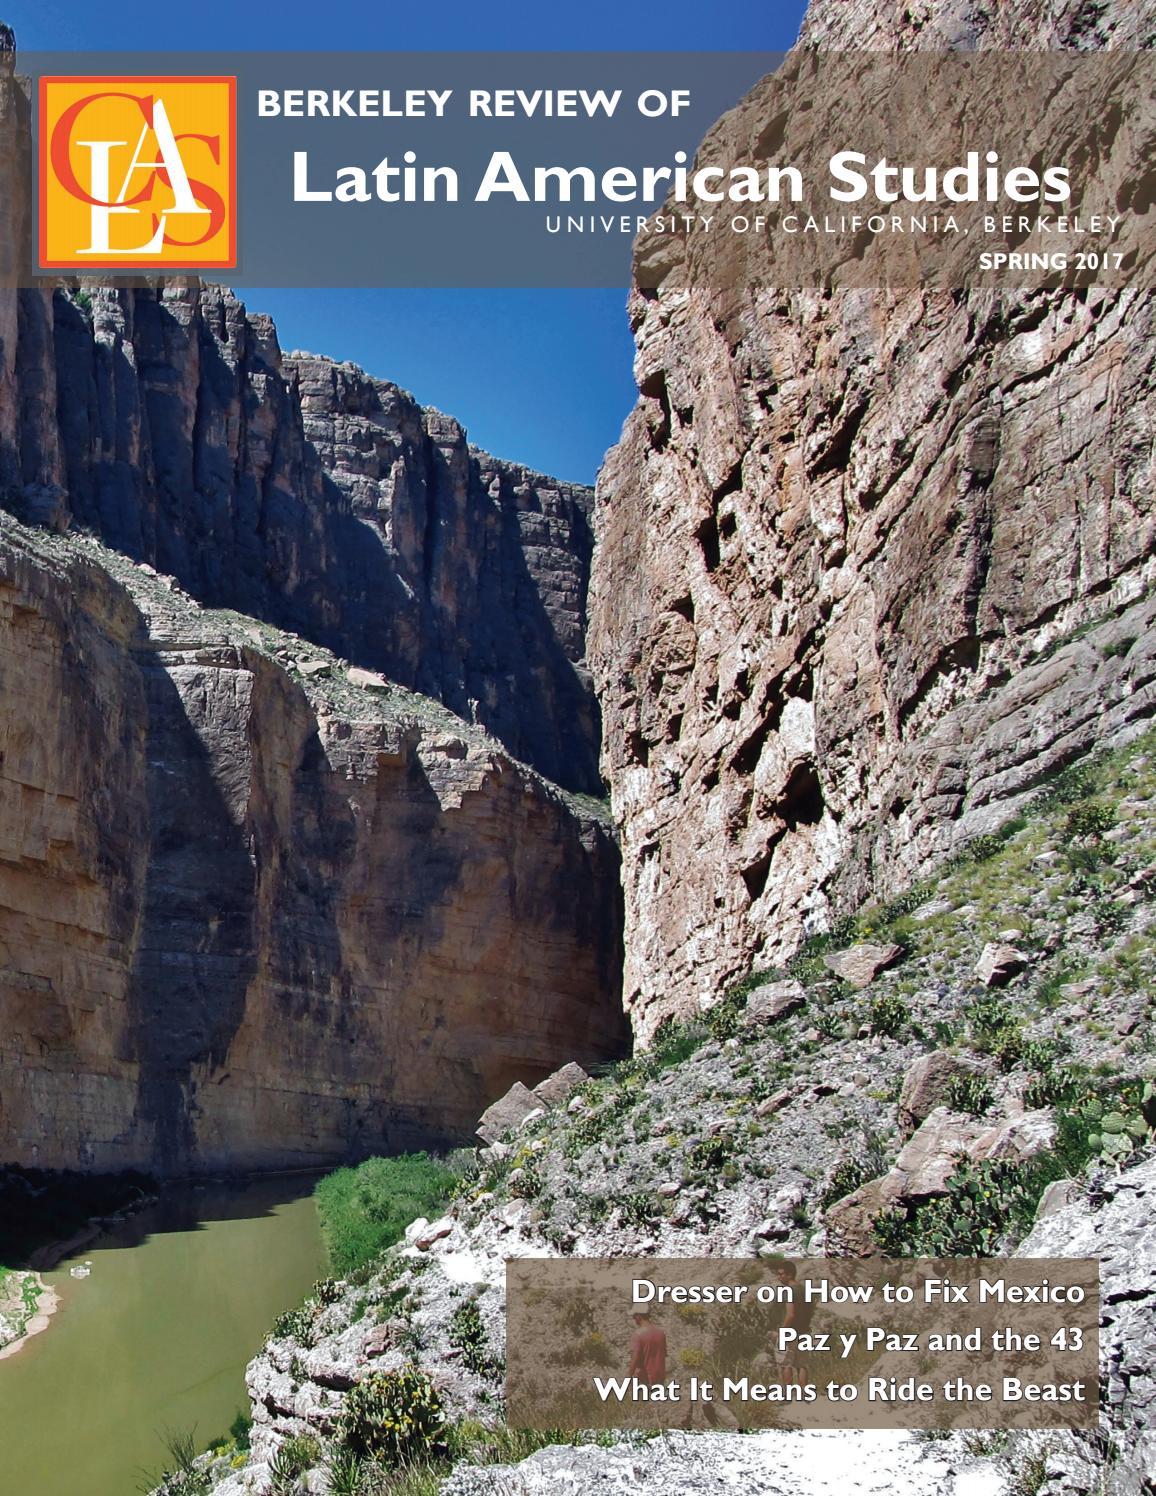 Berkeley Review of Latin American Studies, Spring 2017 by